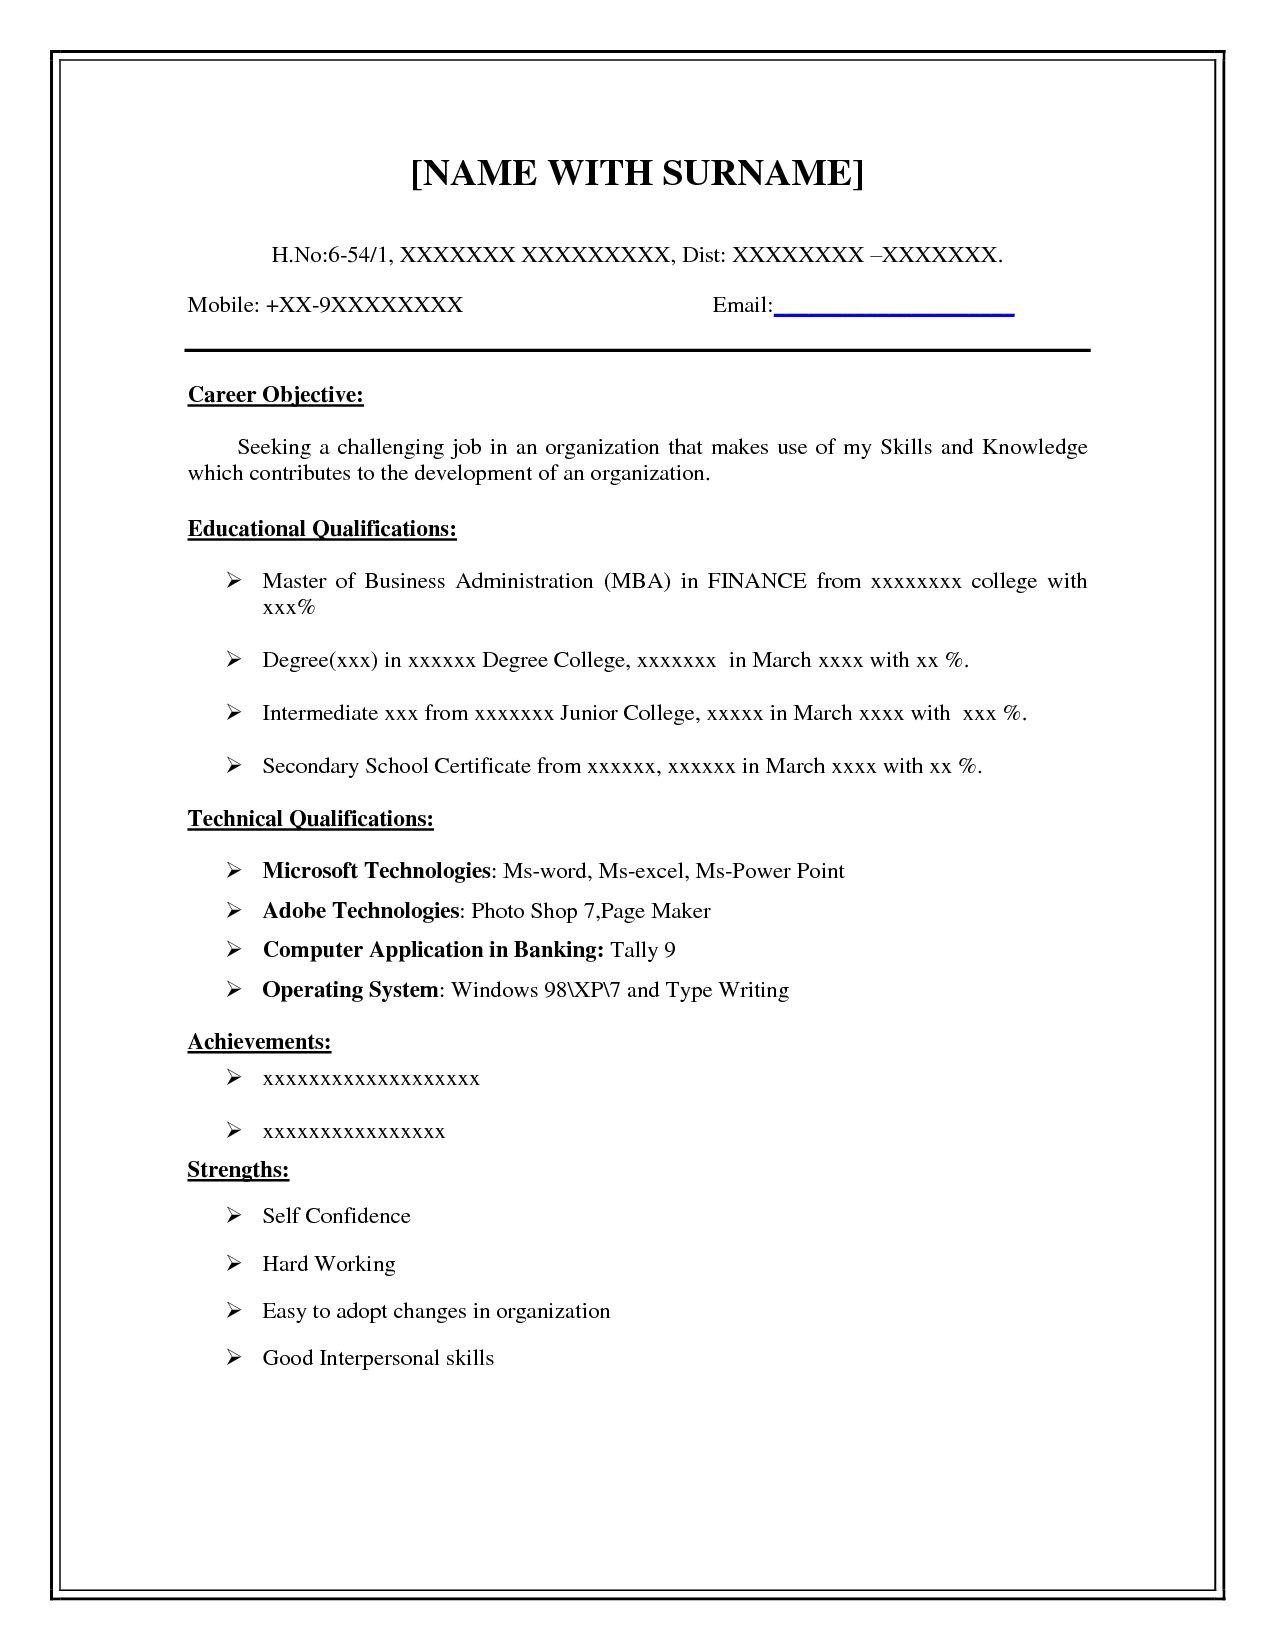 Easy And Free Resume Templates Basic resume, Resume